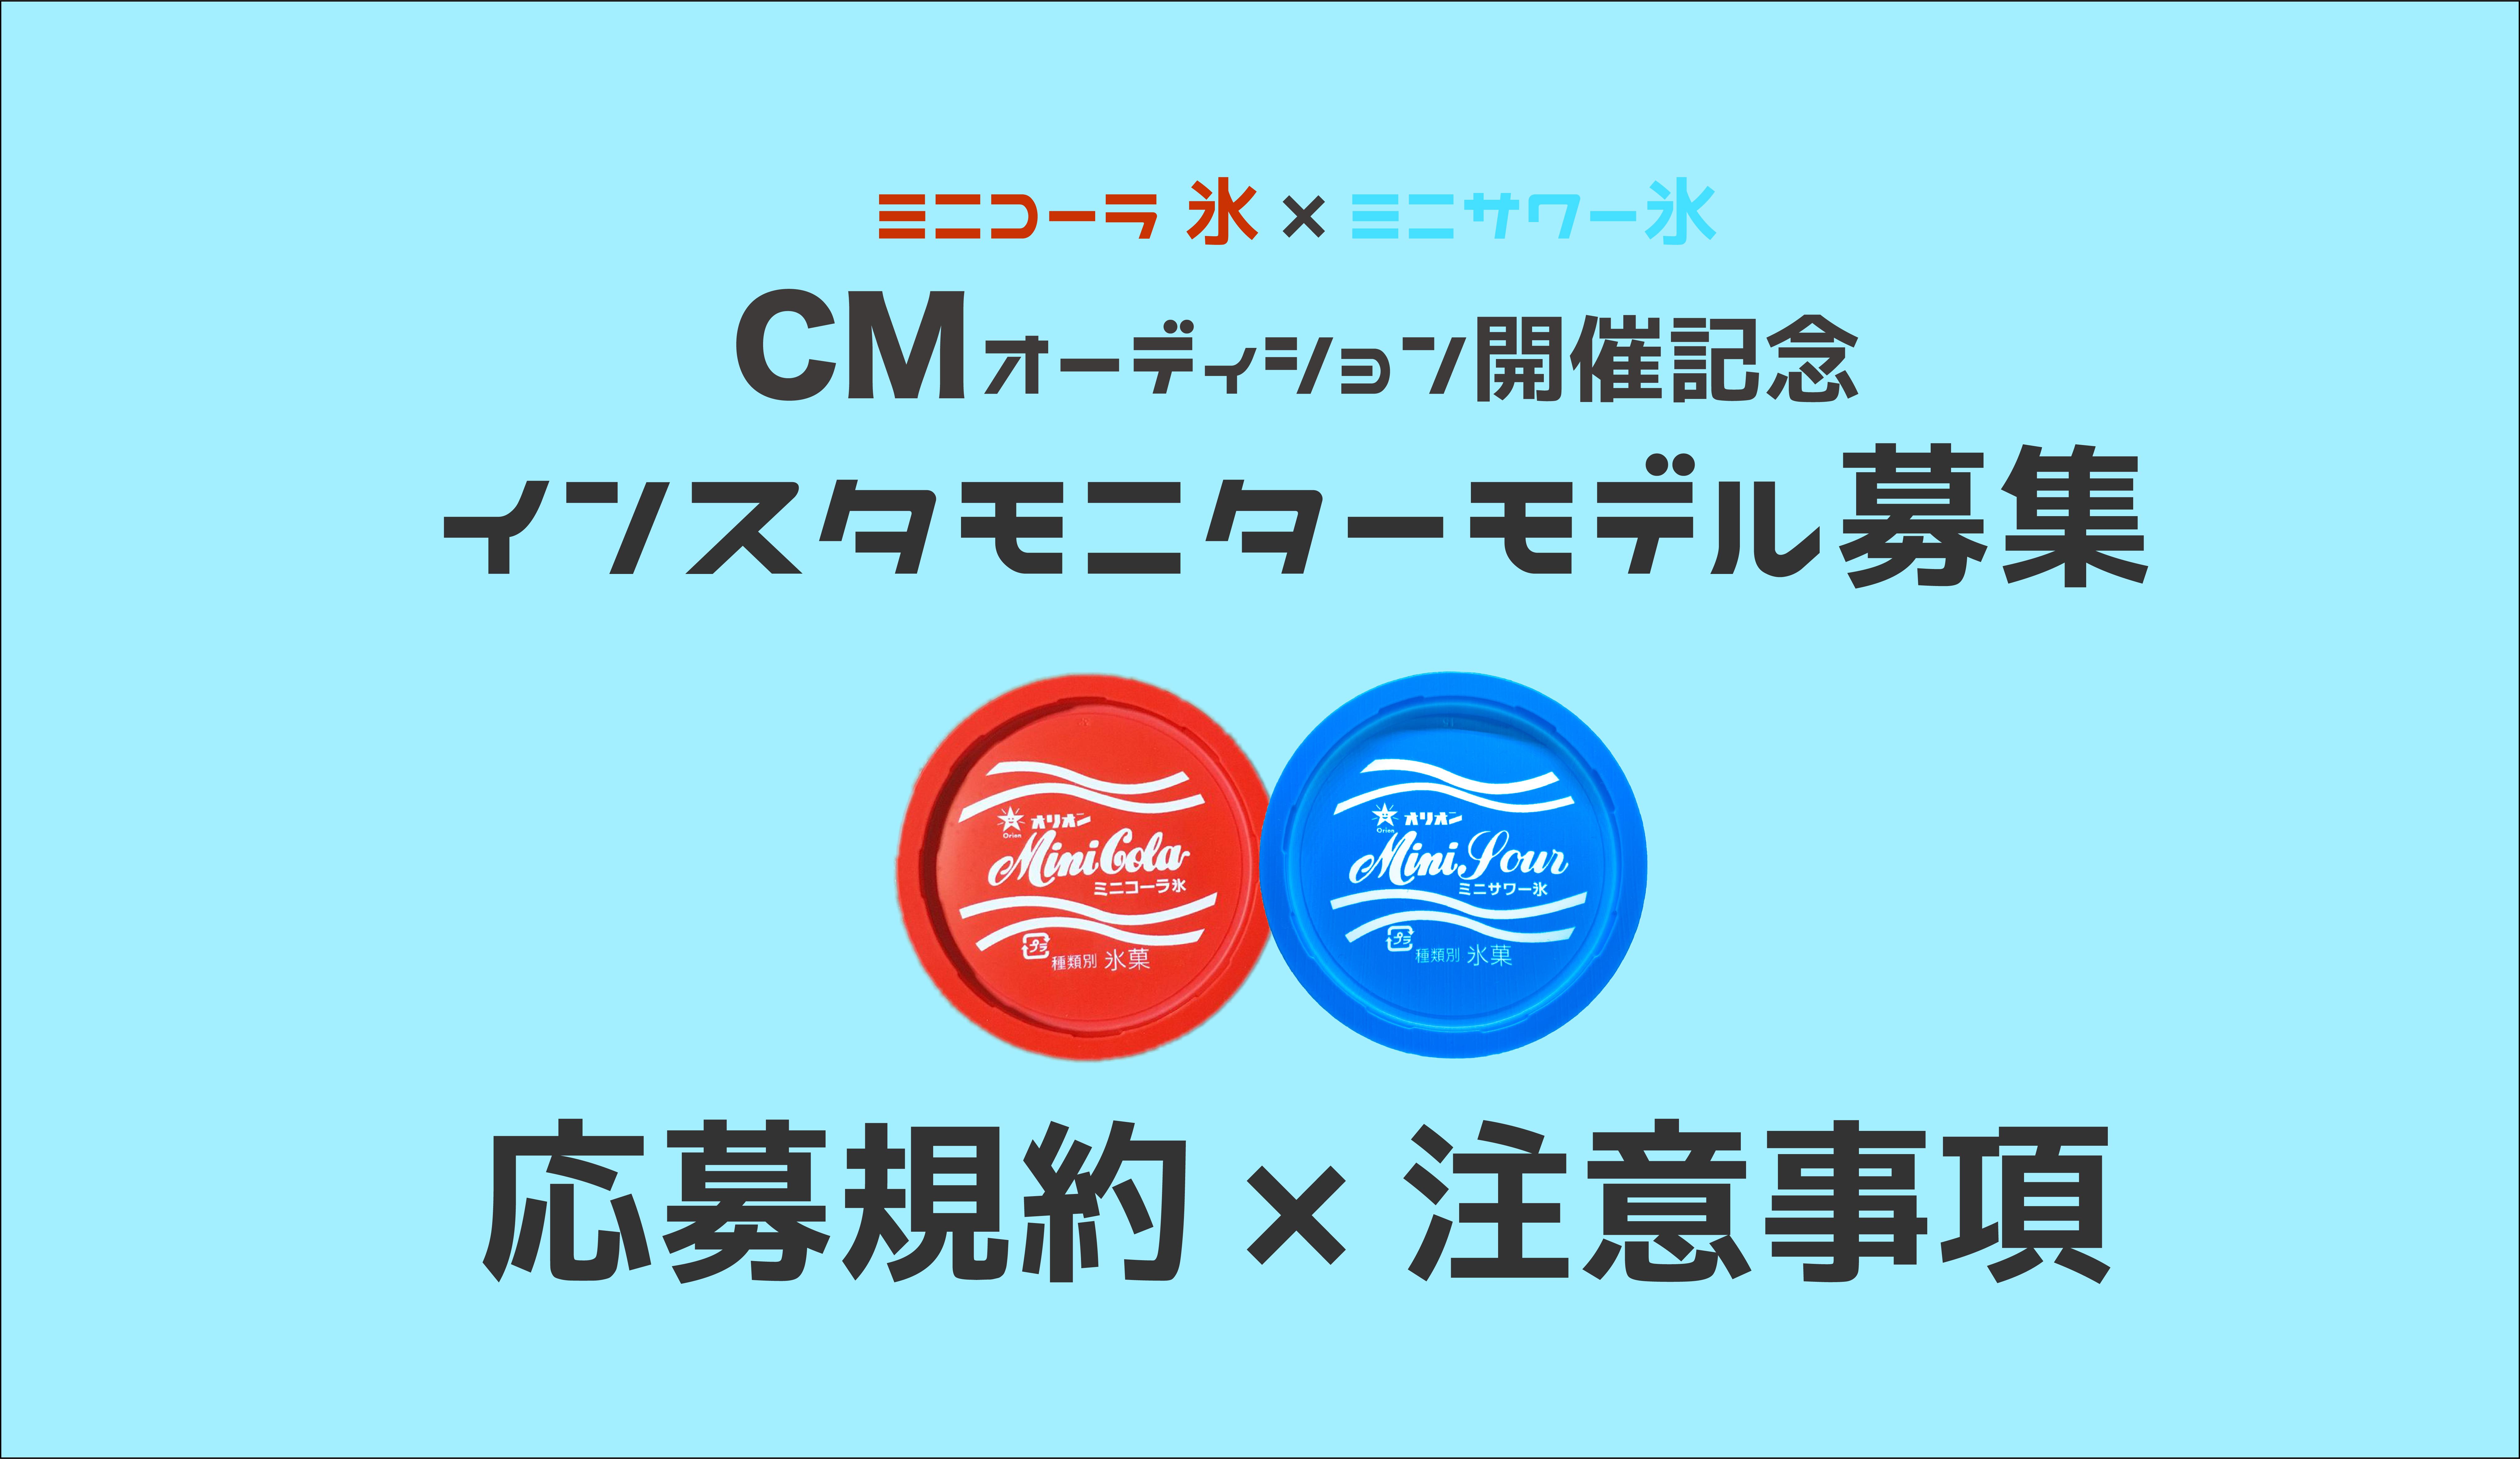 CMオーディション開催記念インスタグラムモニターモデルキャンペーンに関する応募規約、注意事項